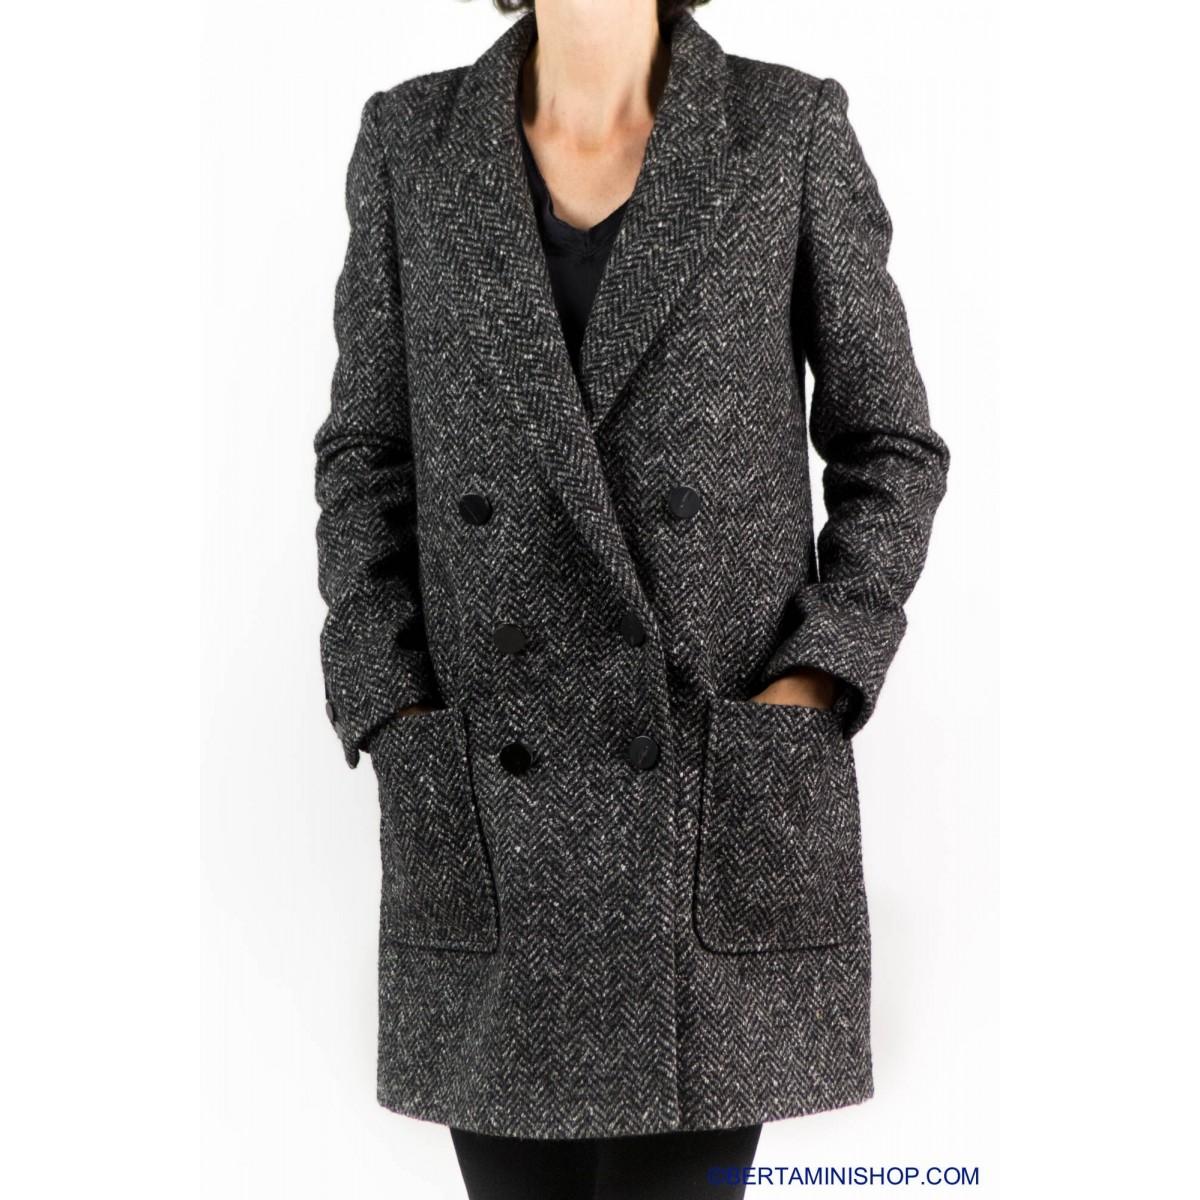 Coat Paltò Italia Woman - Amelia N M001- Nero spinato